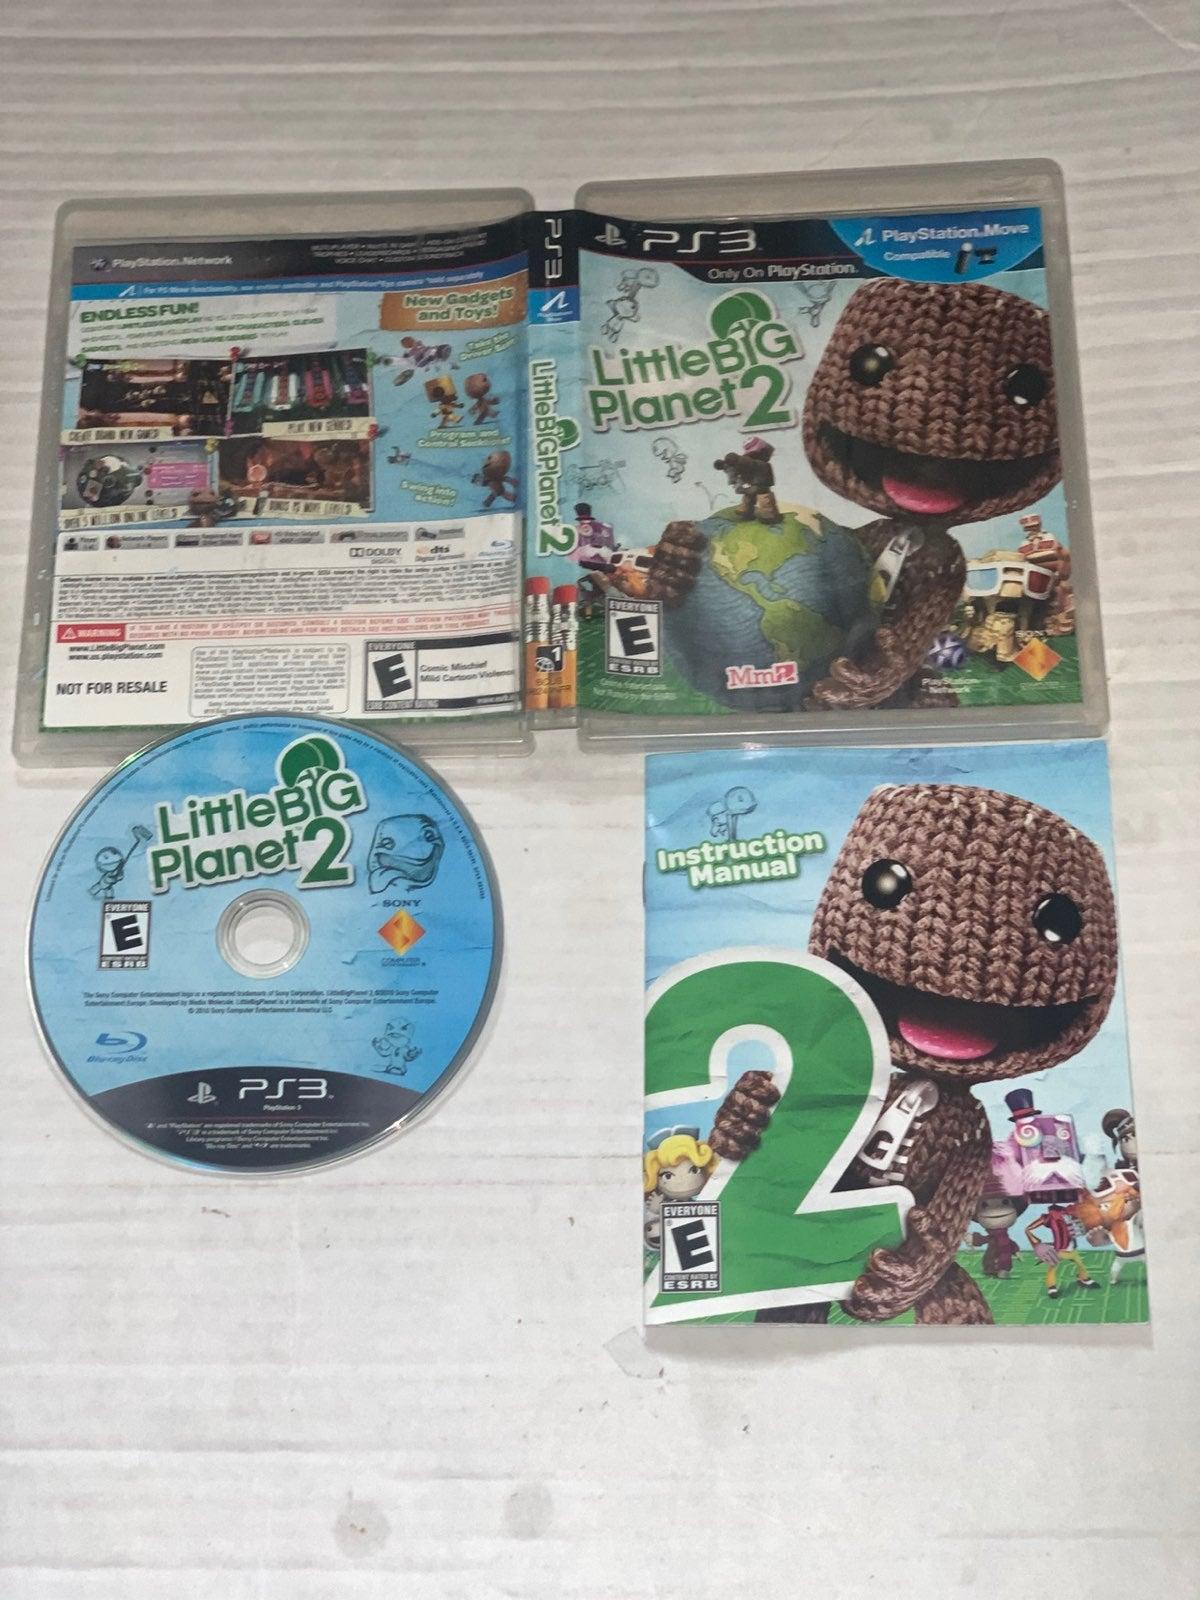 Playstation PS3 LittleBigPlanet 2